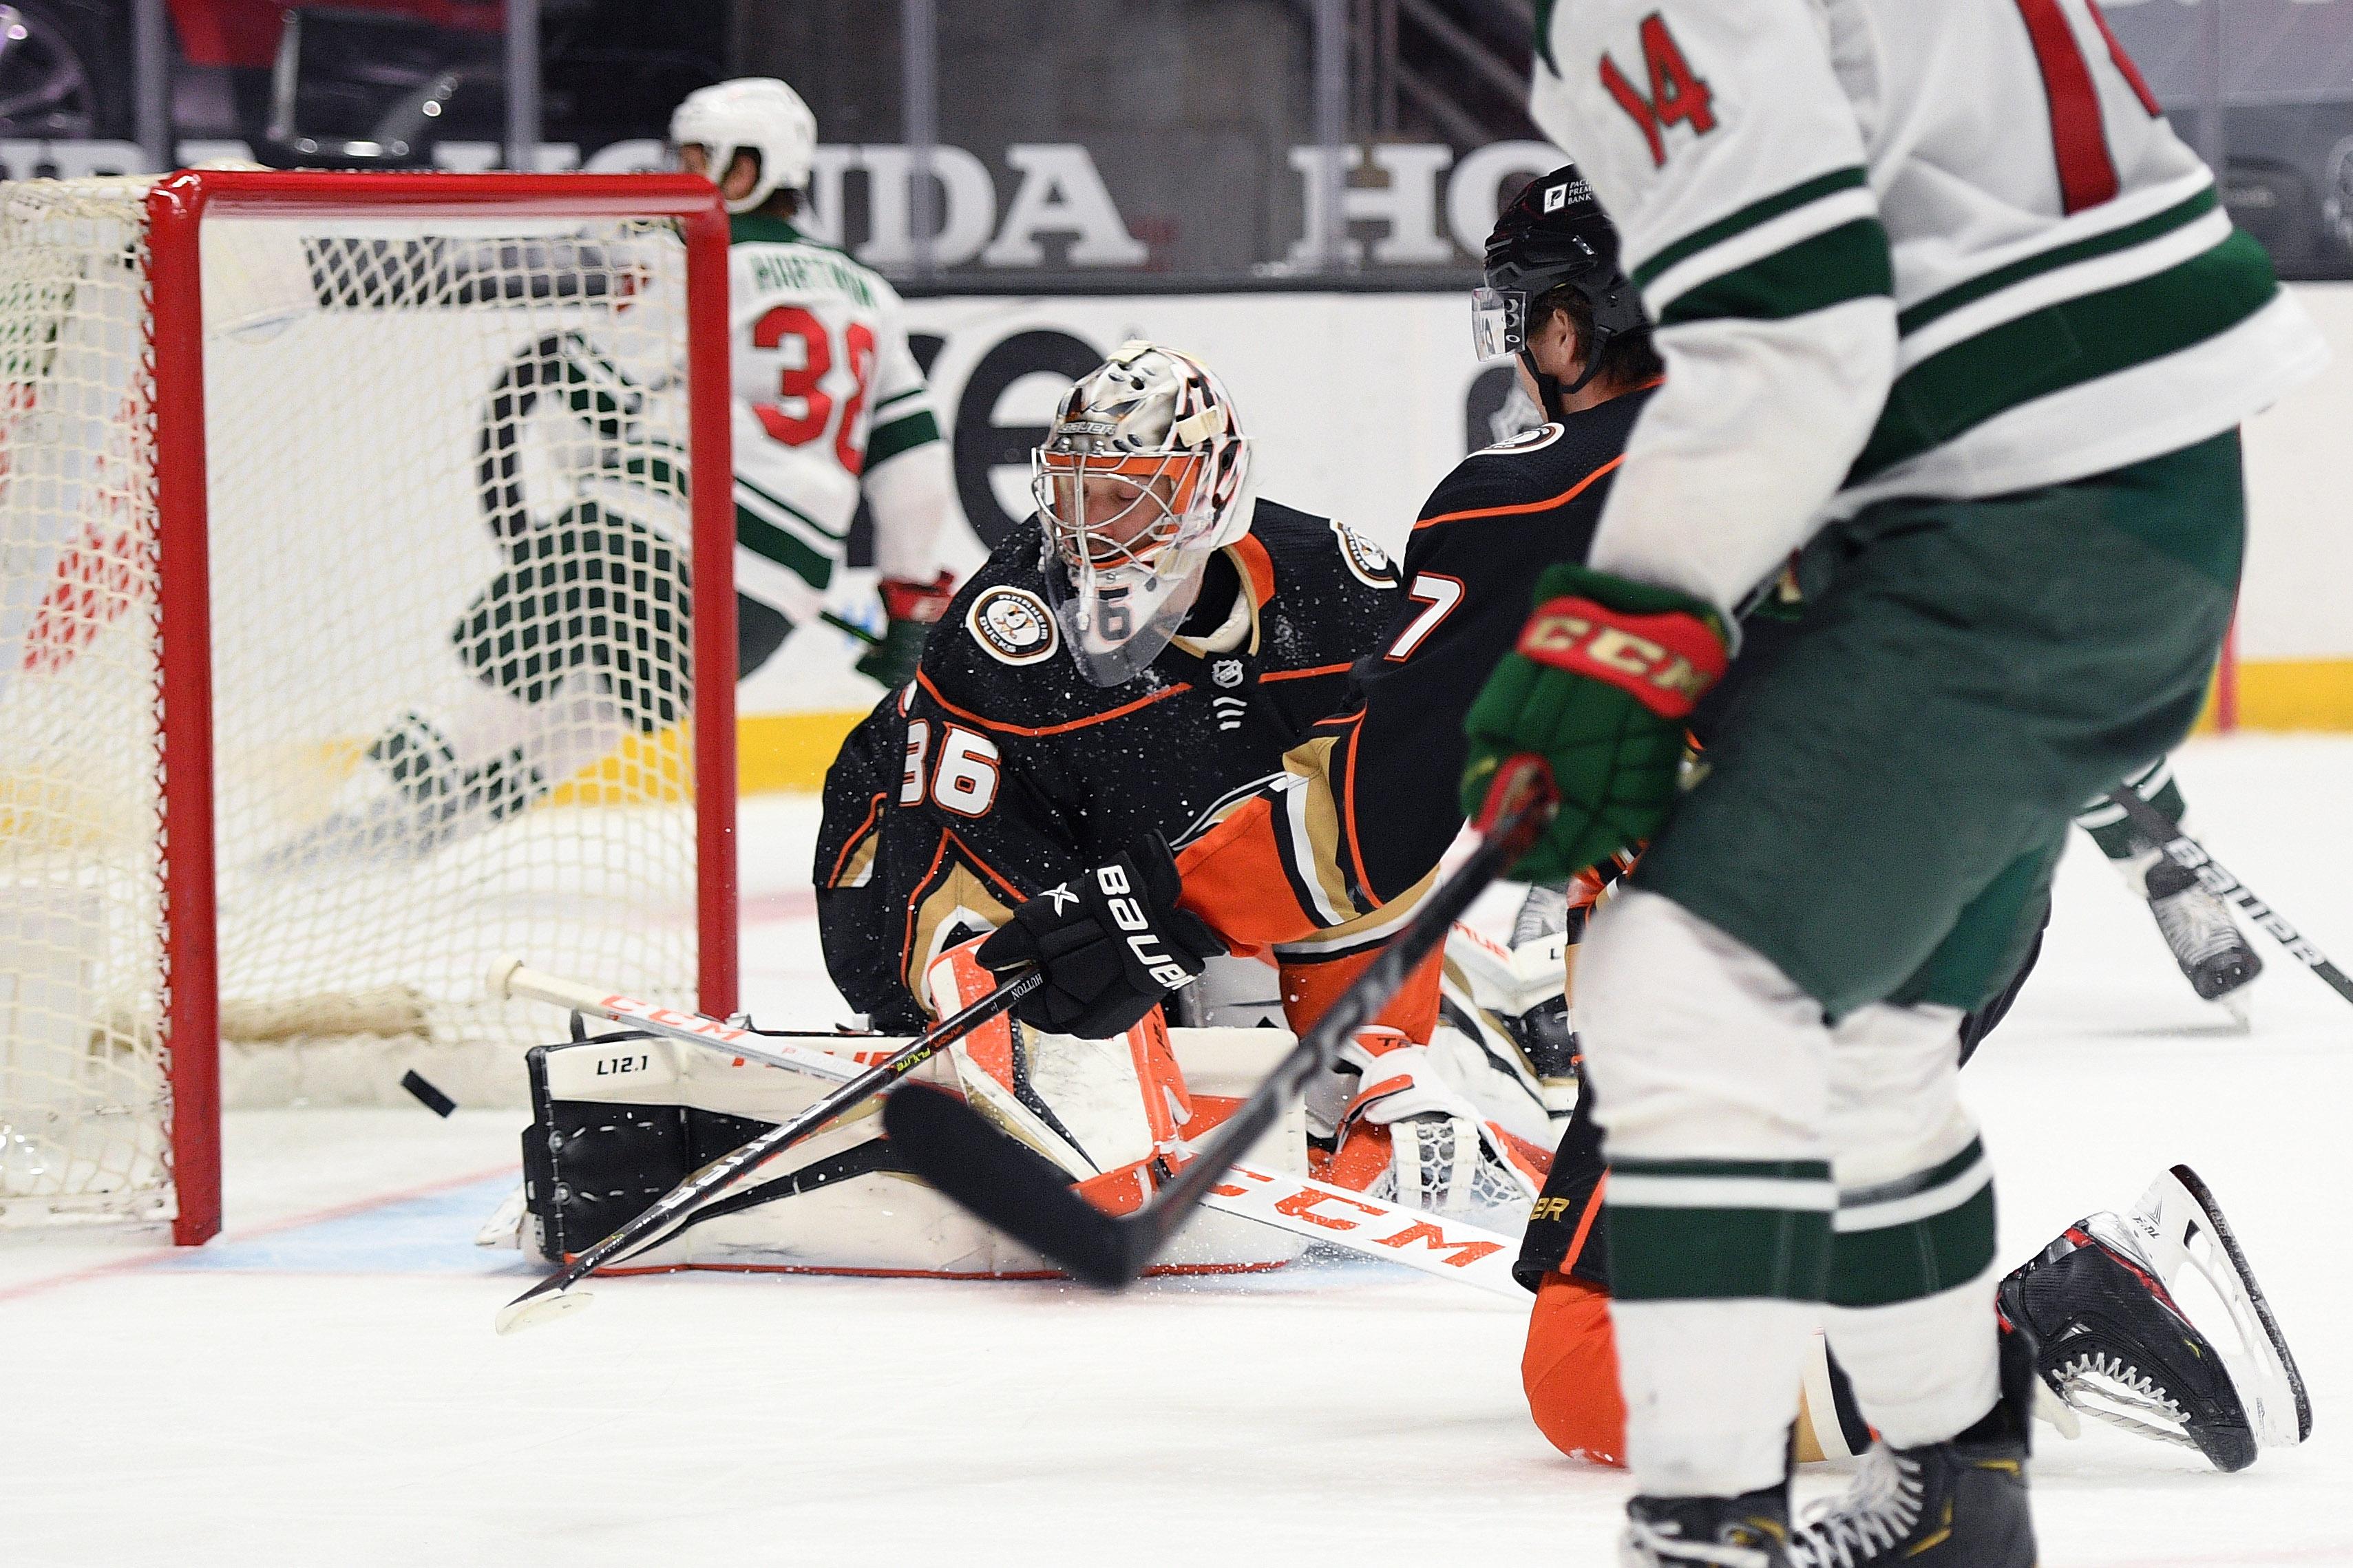 Game Preview: Minnesota Wild vs. Anaheim Ducks 3/22/21 @ 6:30PM CST at Xcel Energy Center